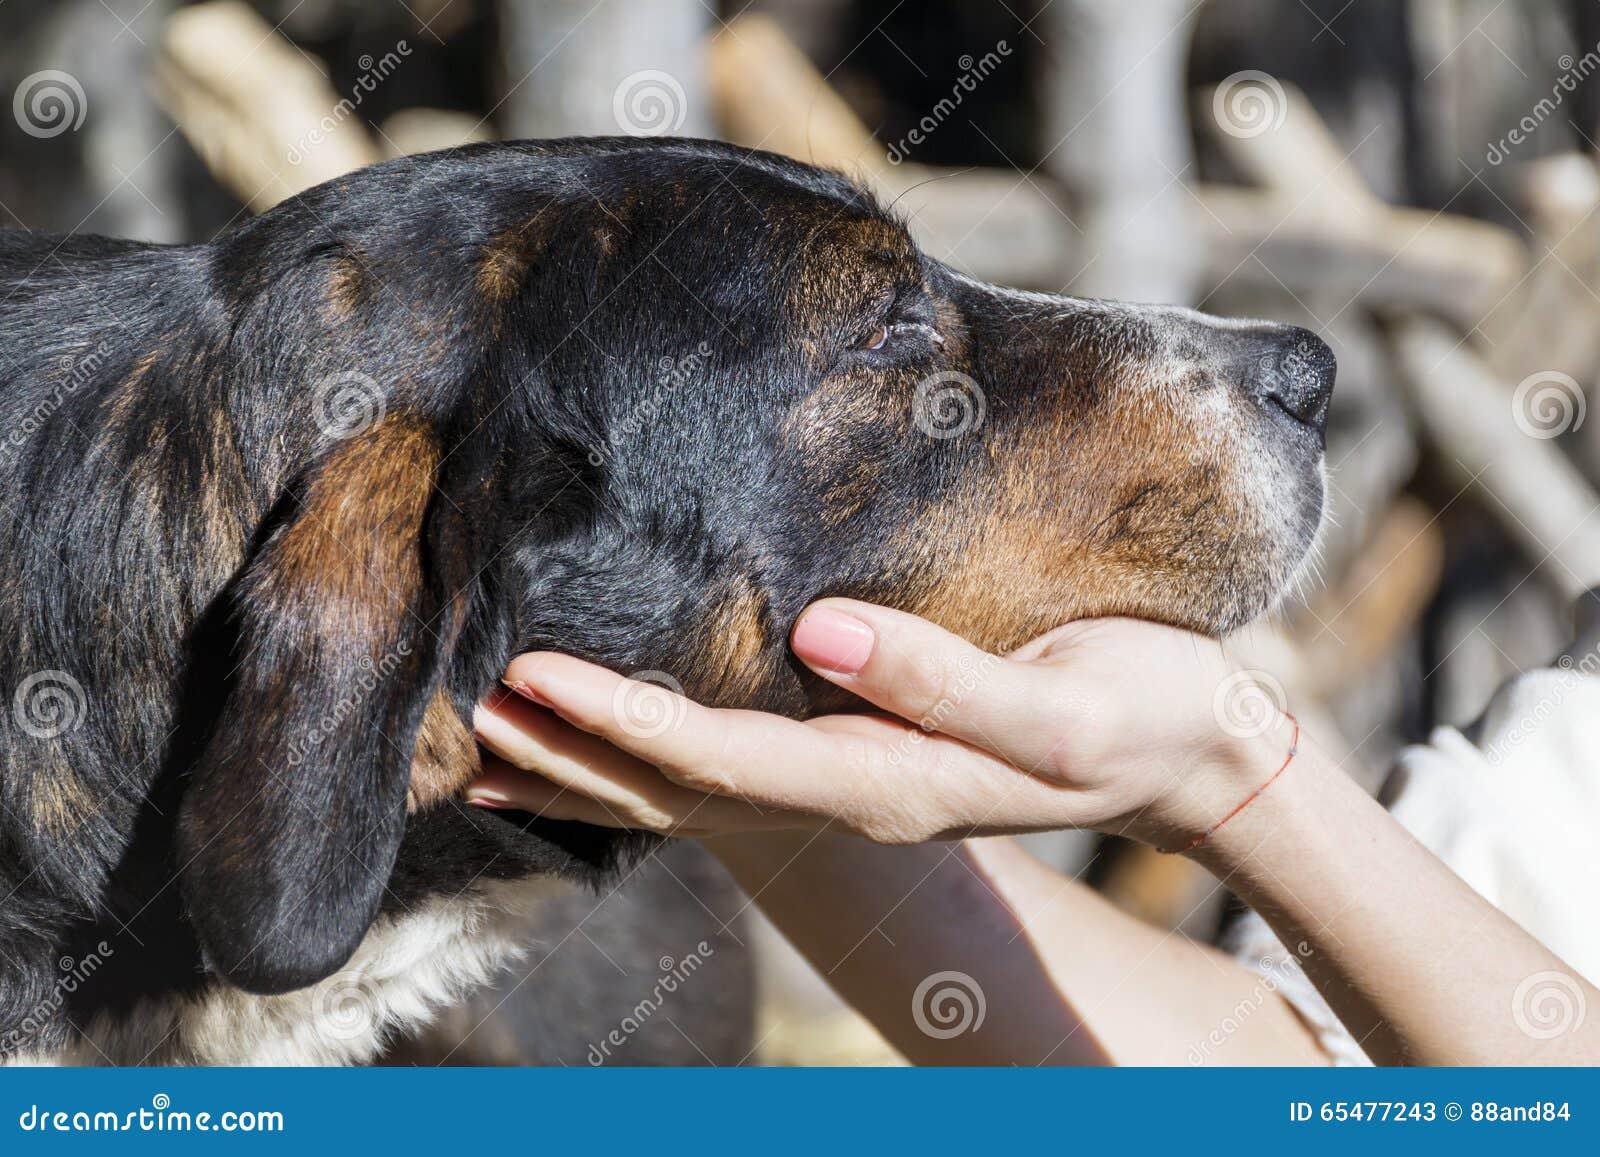 Woman hands fondle a homeless dog